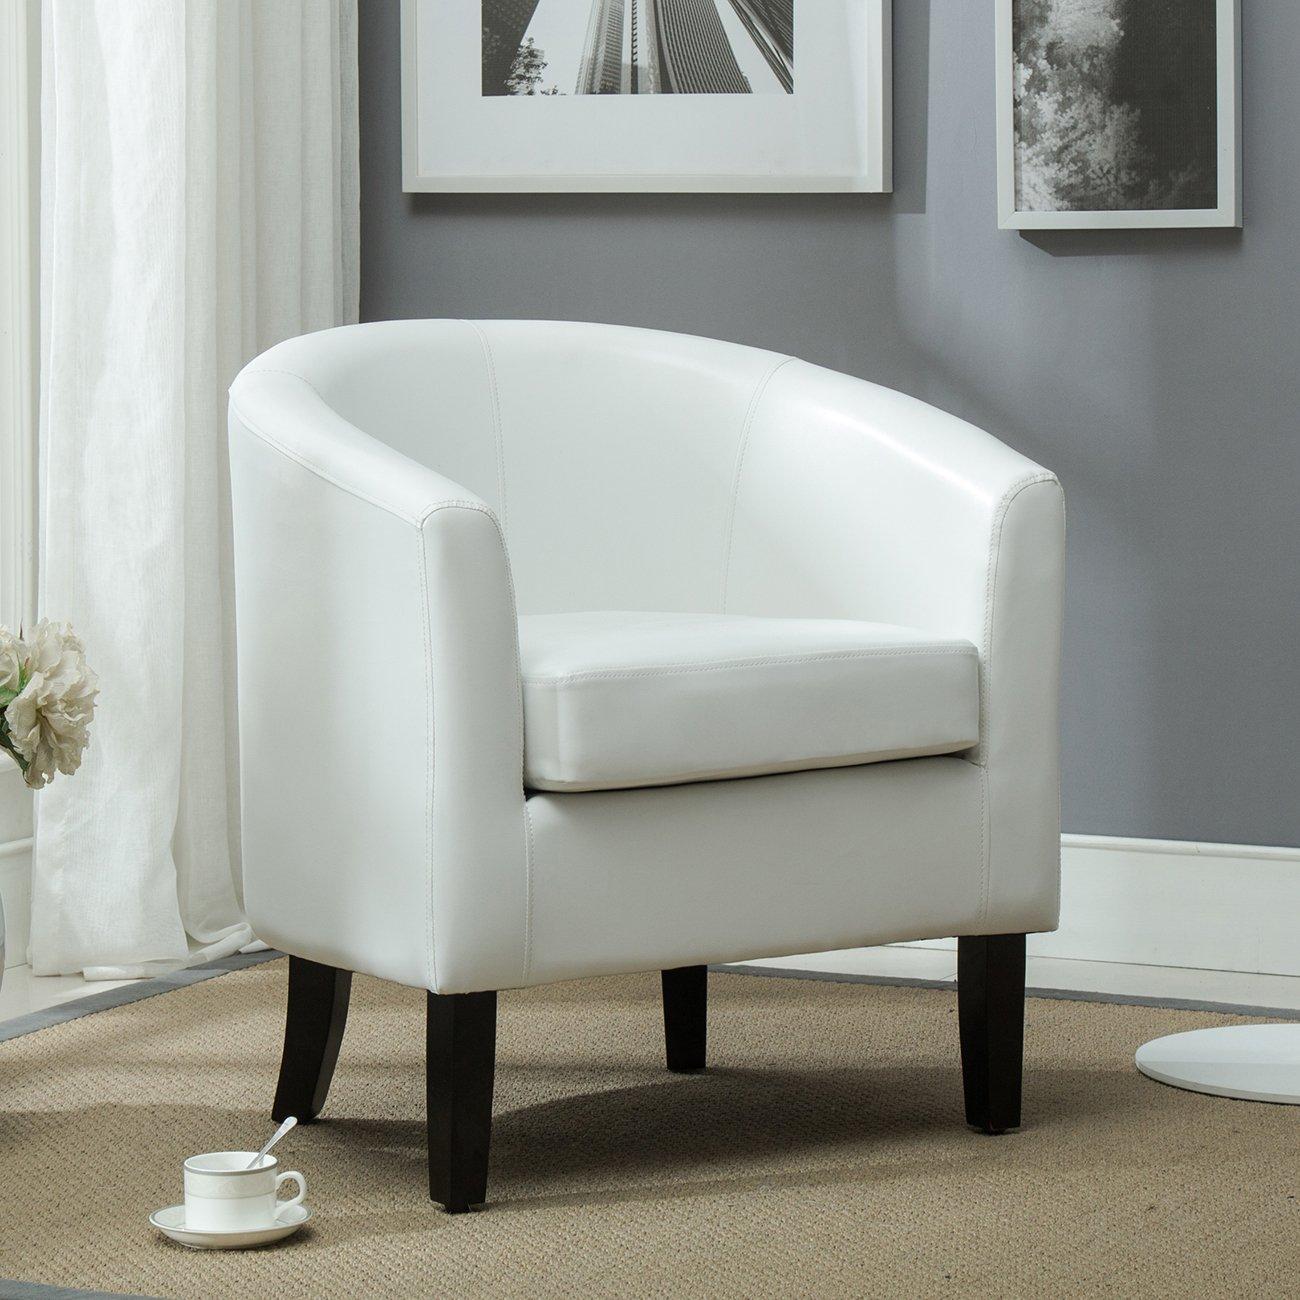 Amazon.com: Belleze Club Chair Tub Faux Leather Armchair Seat Accent ...